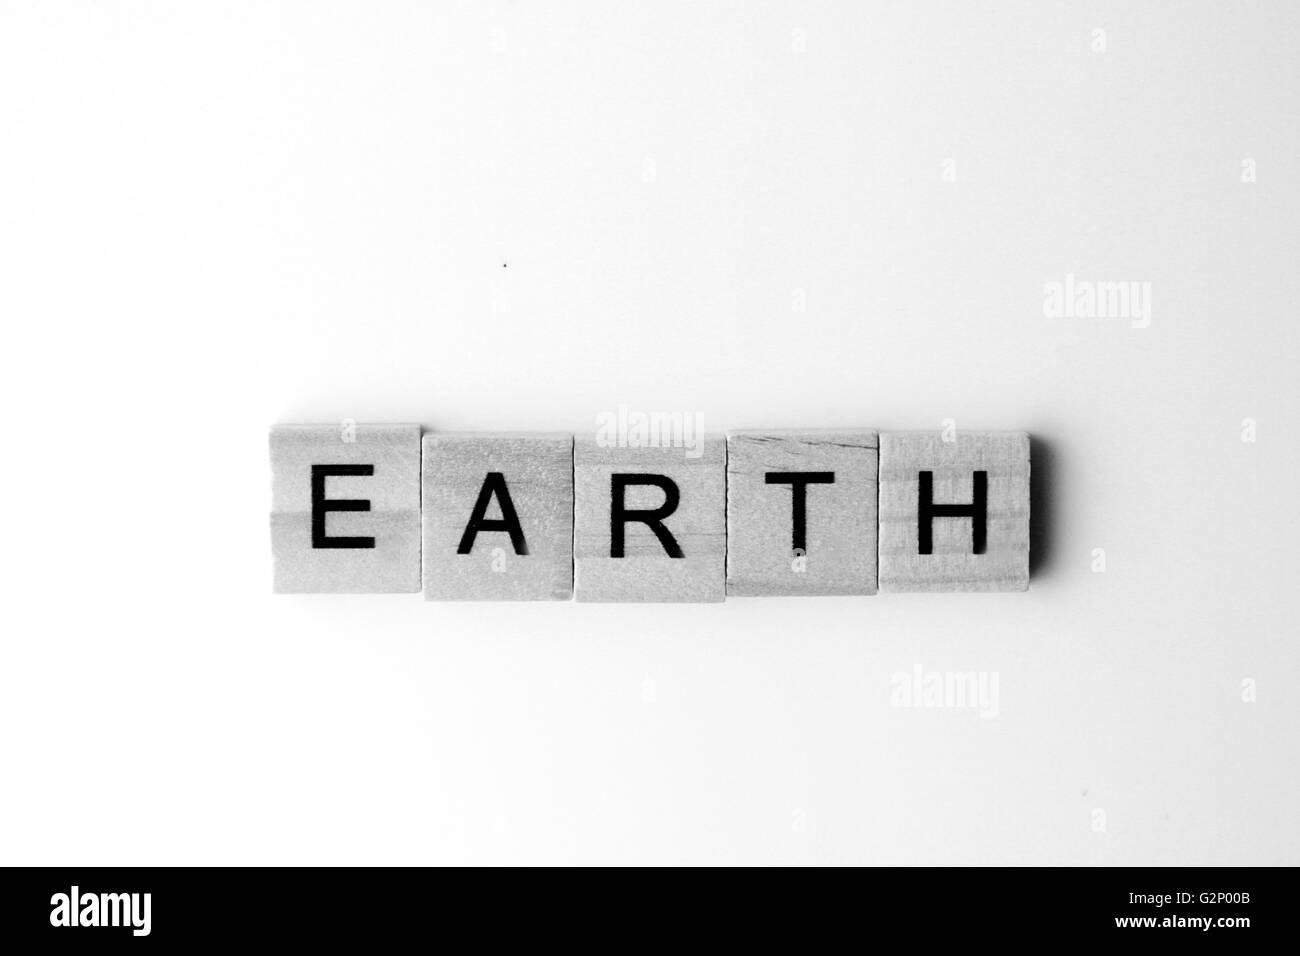 Planet Order from the Sun; Mercury, Venus, Earth, Mars, Jupiter, Saturn, Uranus and Neptune. - Stock Image